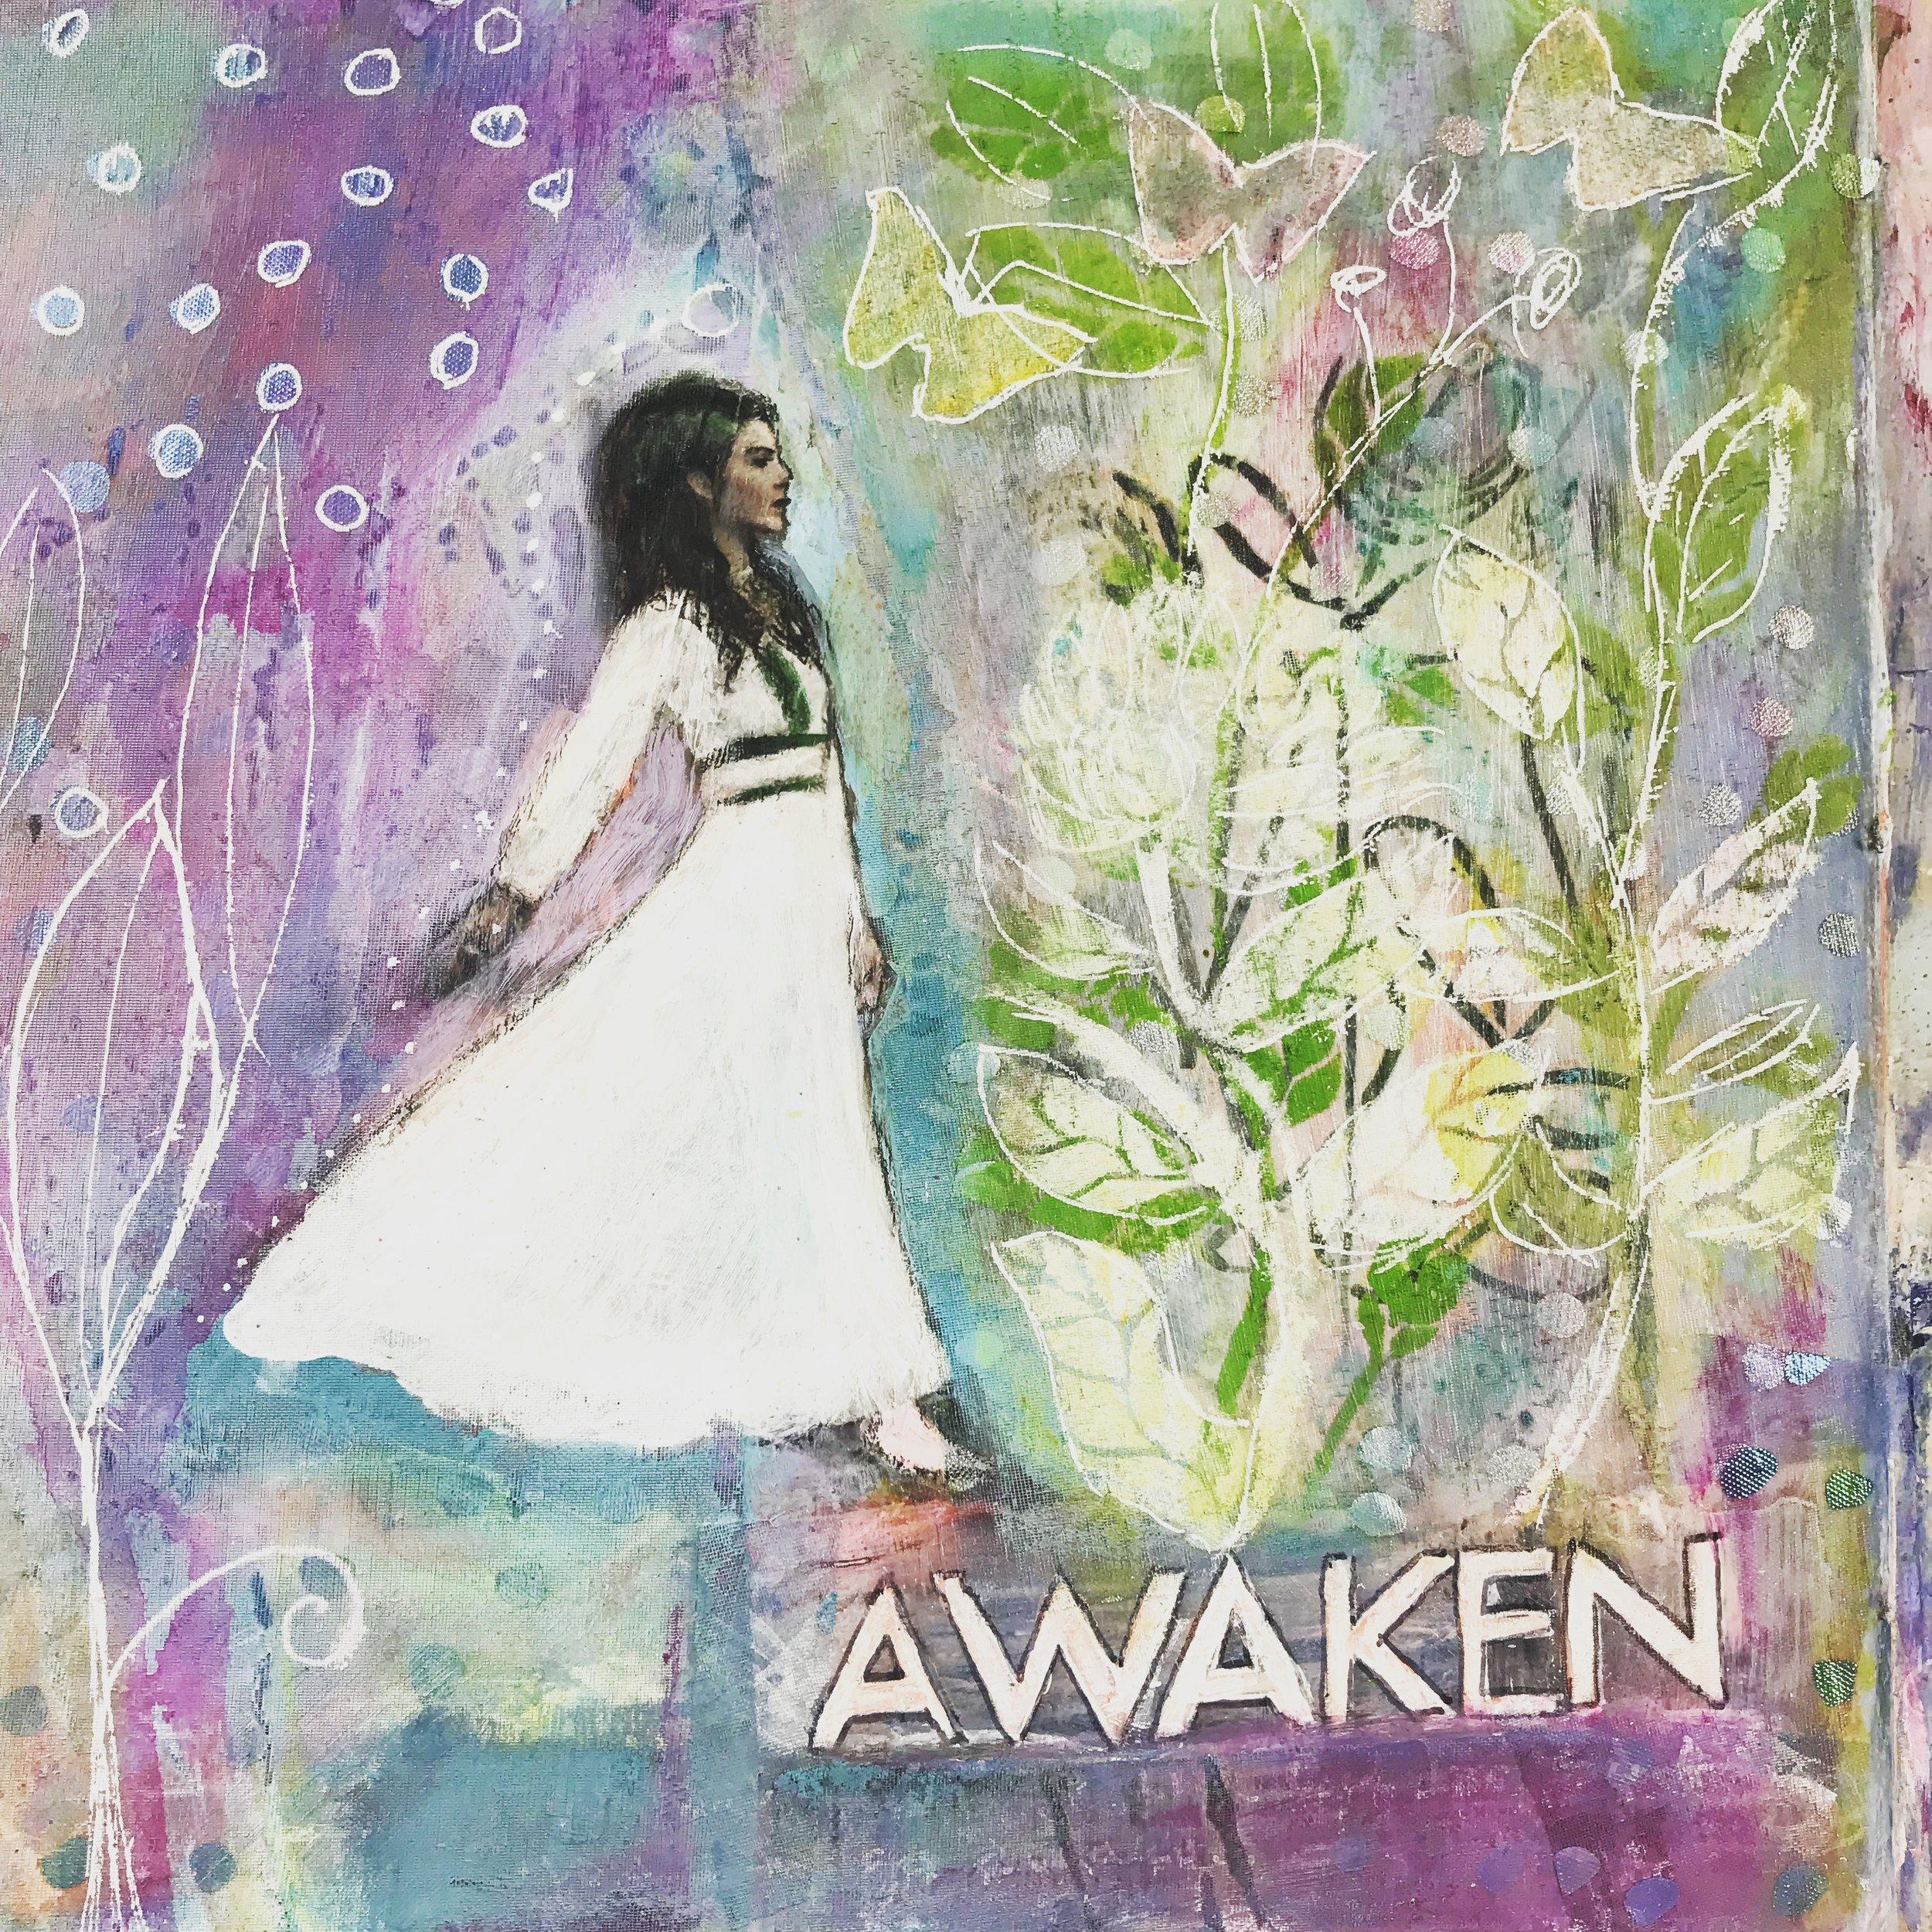 Awaken - art journal 2018 page - Cheryl Sosnowski createspacestudio.com